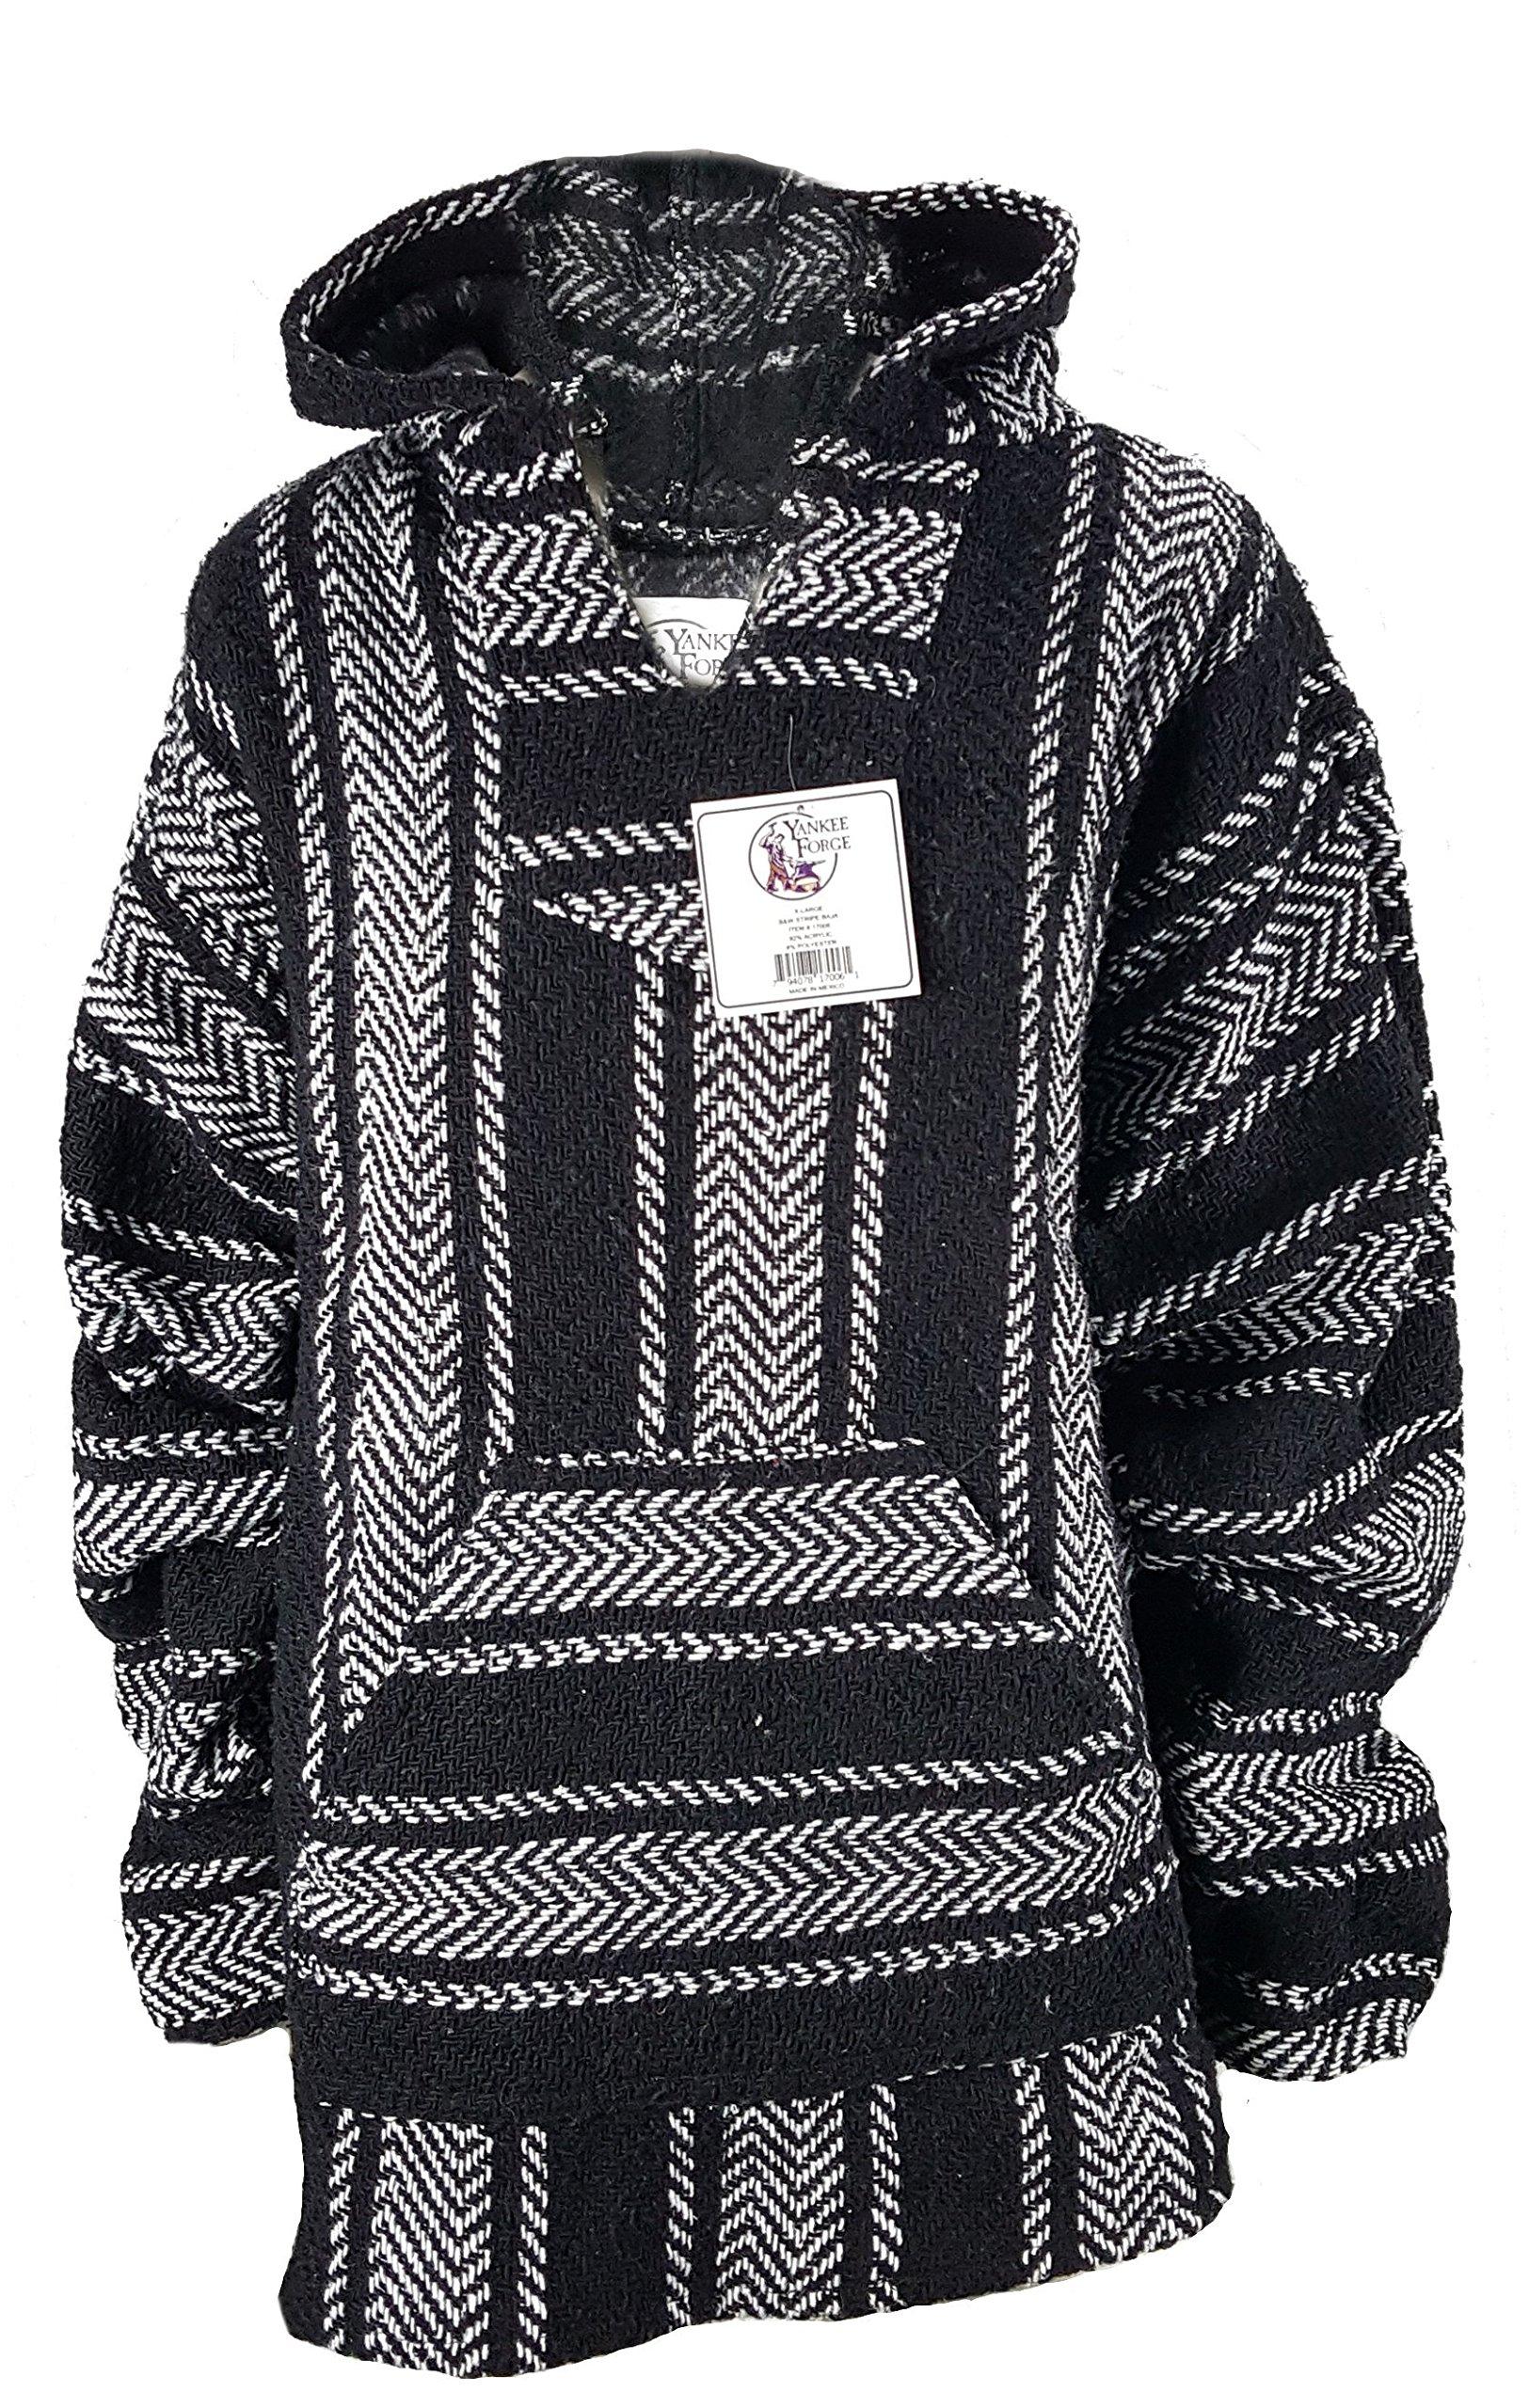 Yankee Forge Medium Baja Shirt - Black & White Stripe - Woven Hoodie - Soft Brushed Inside - Unisex Pullover